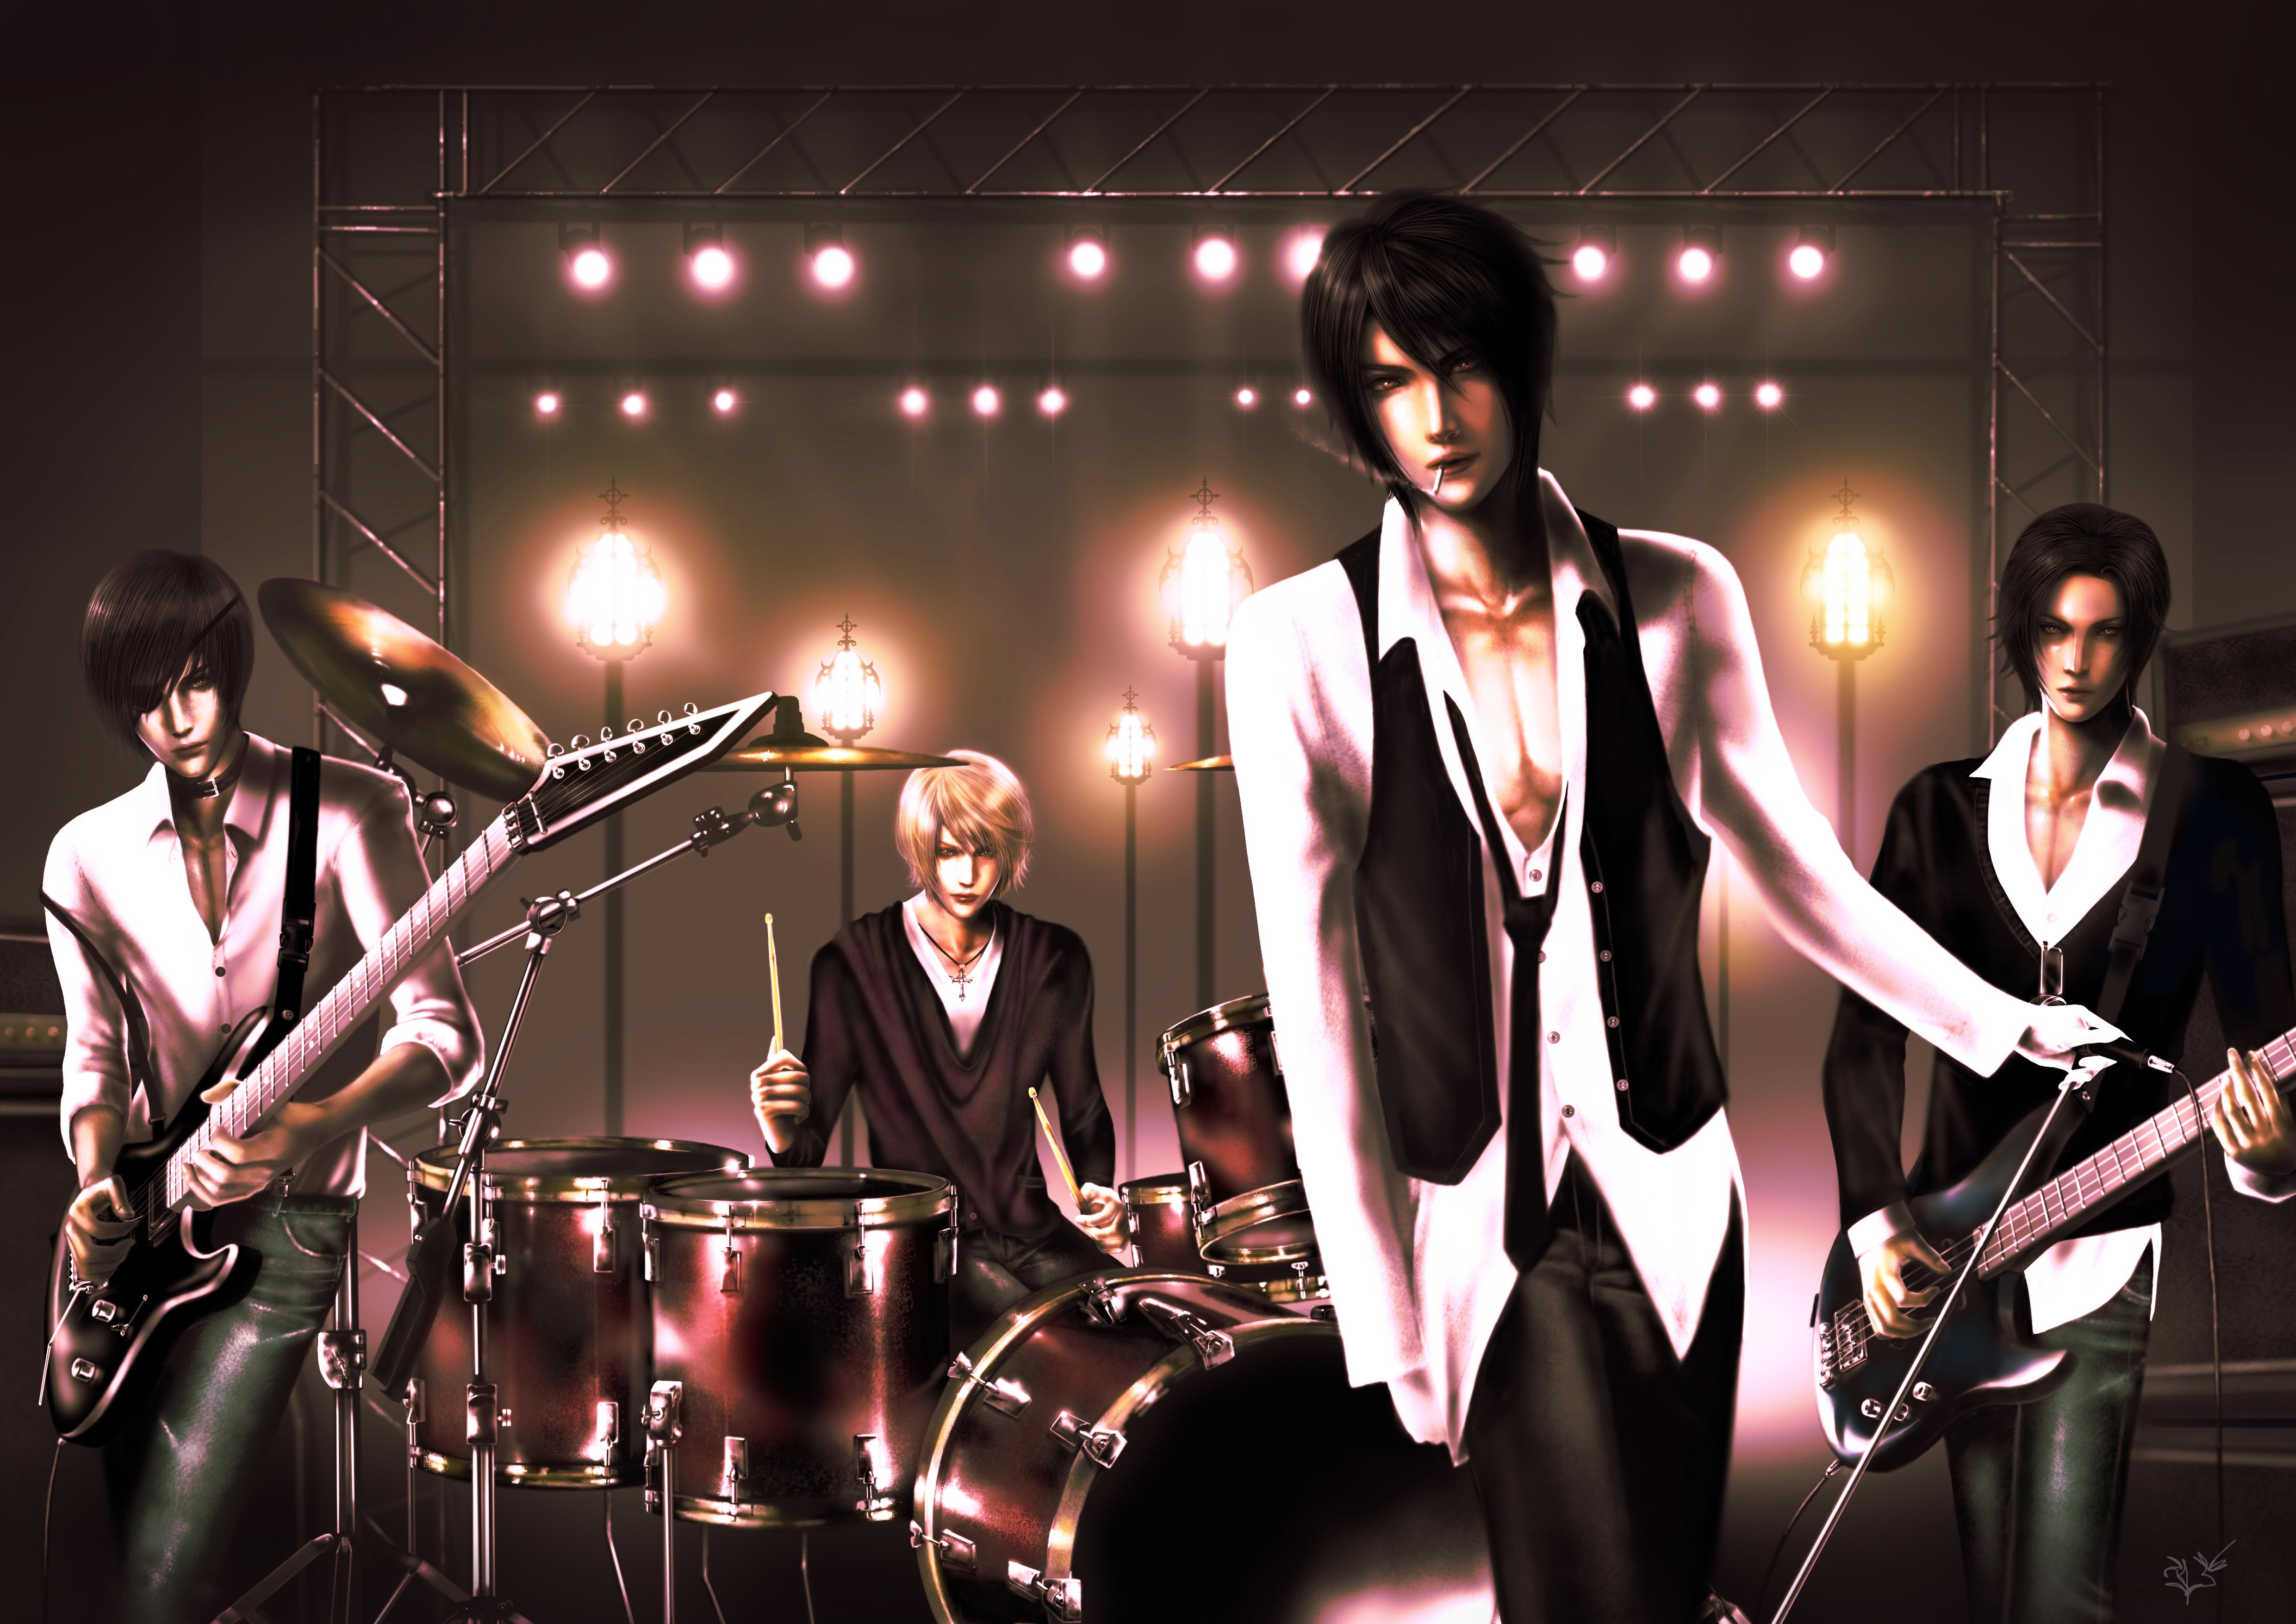 Kuroshitsuji band by thanomluk